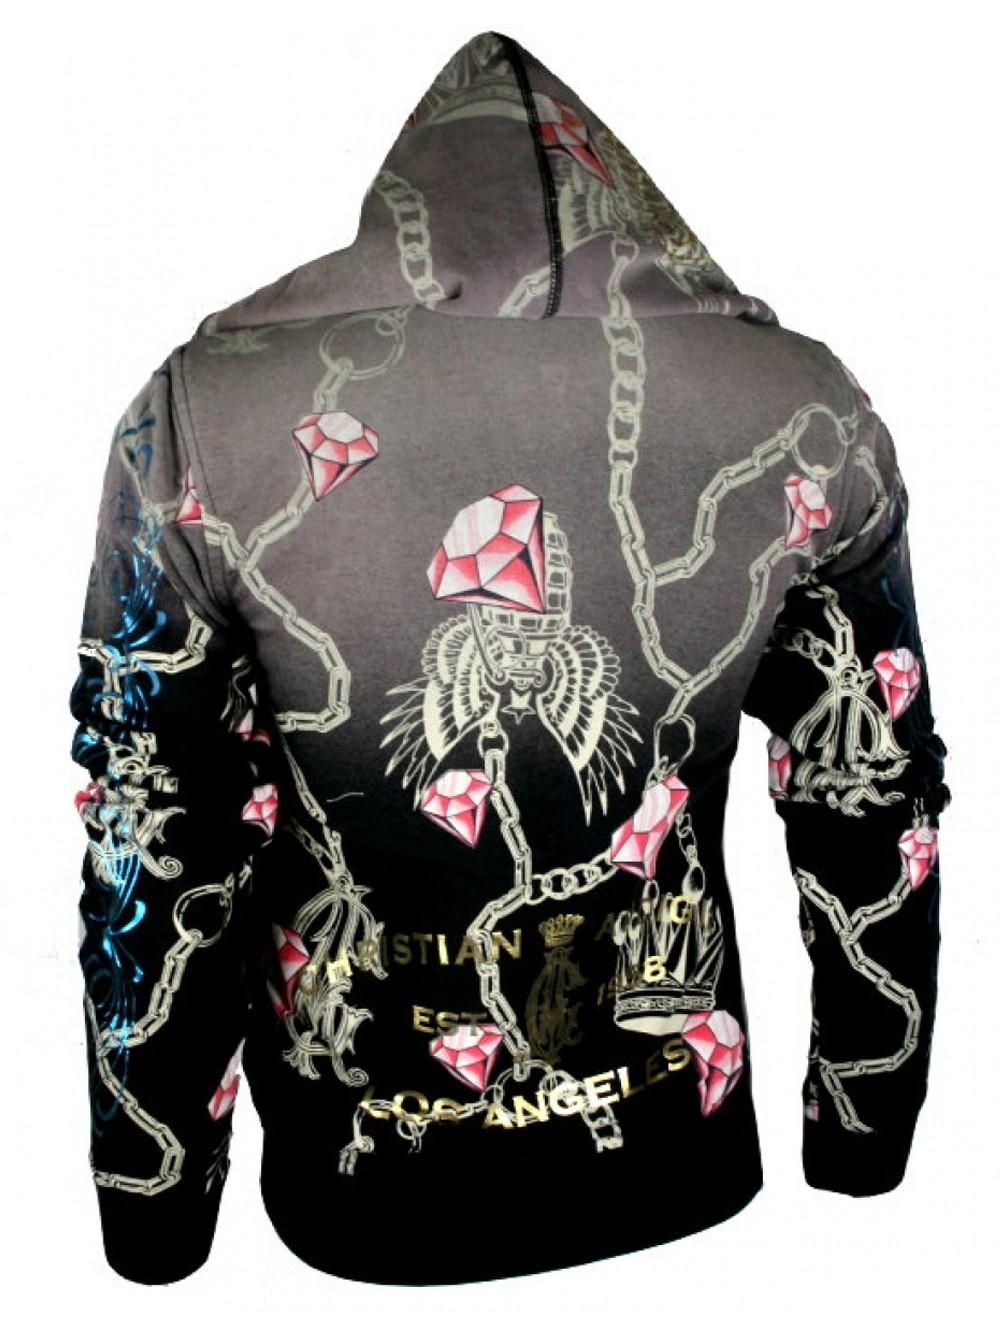 Christian audigier hoodie